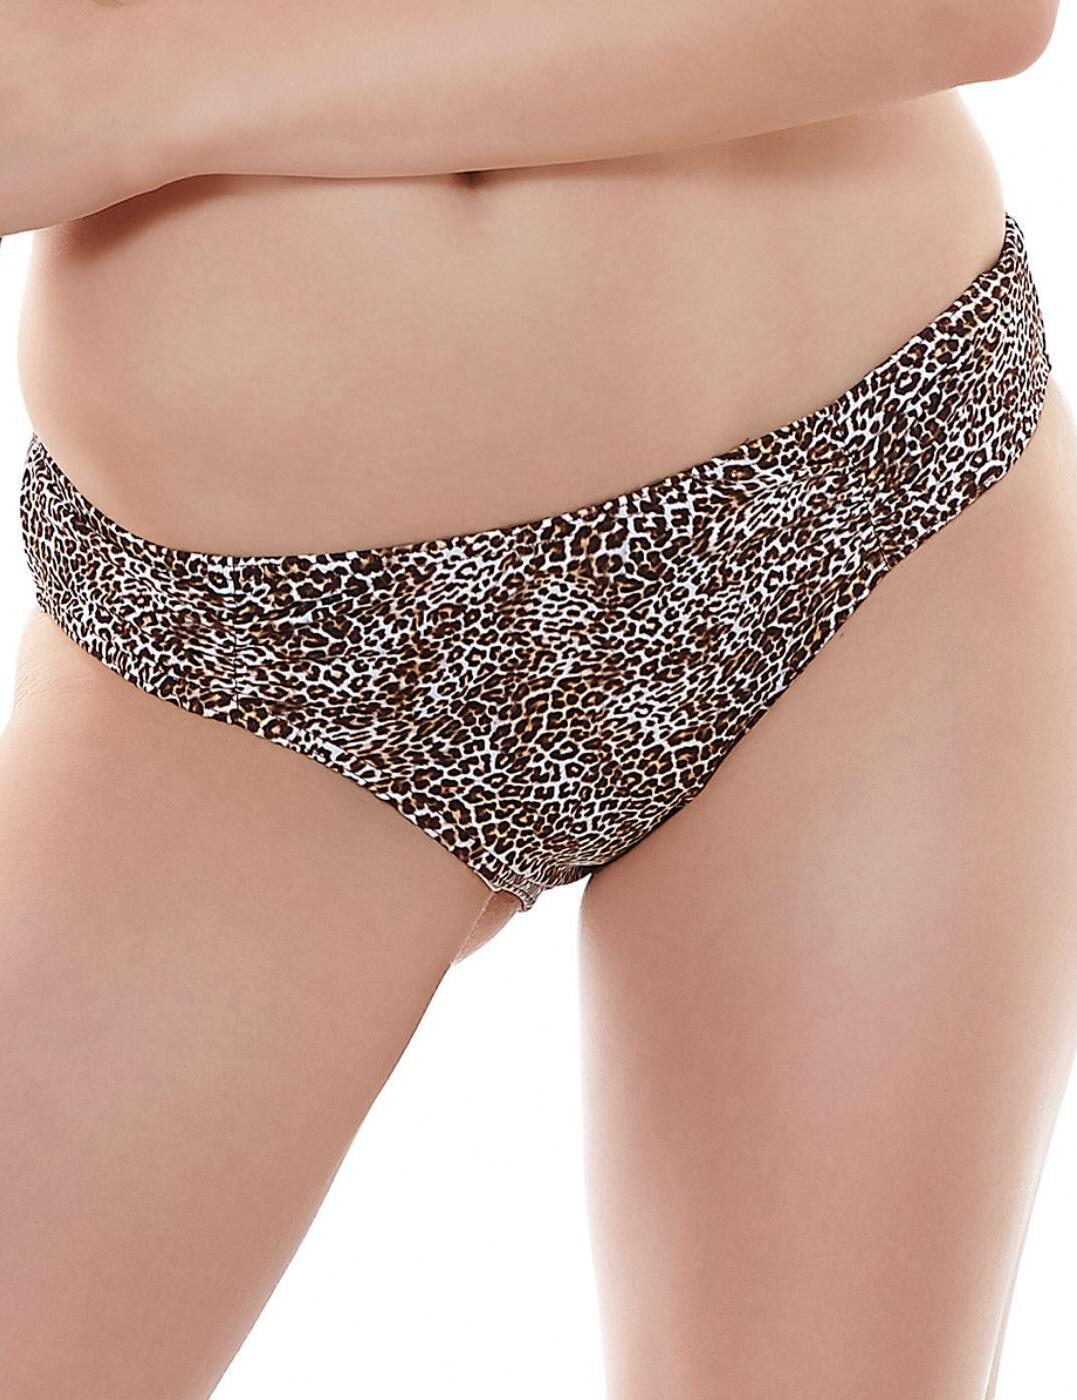 3941 Freya Rumble Gathered Hipster Bikini Brief Leopard - 3941 Gathered Brief